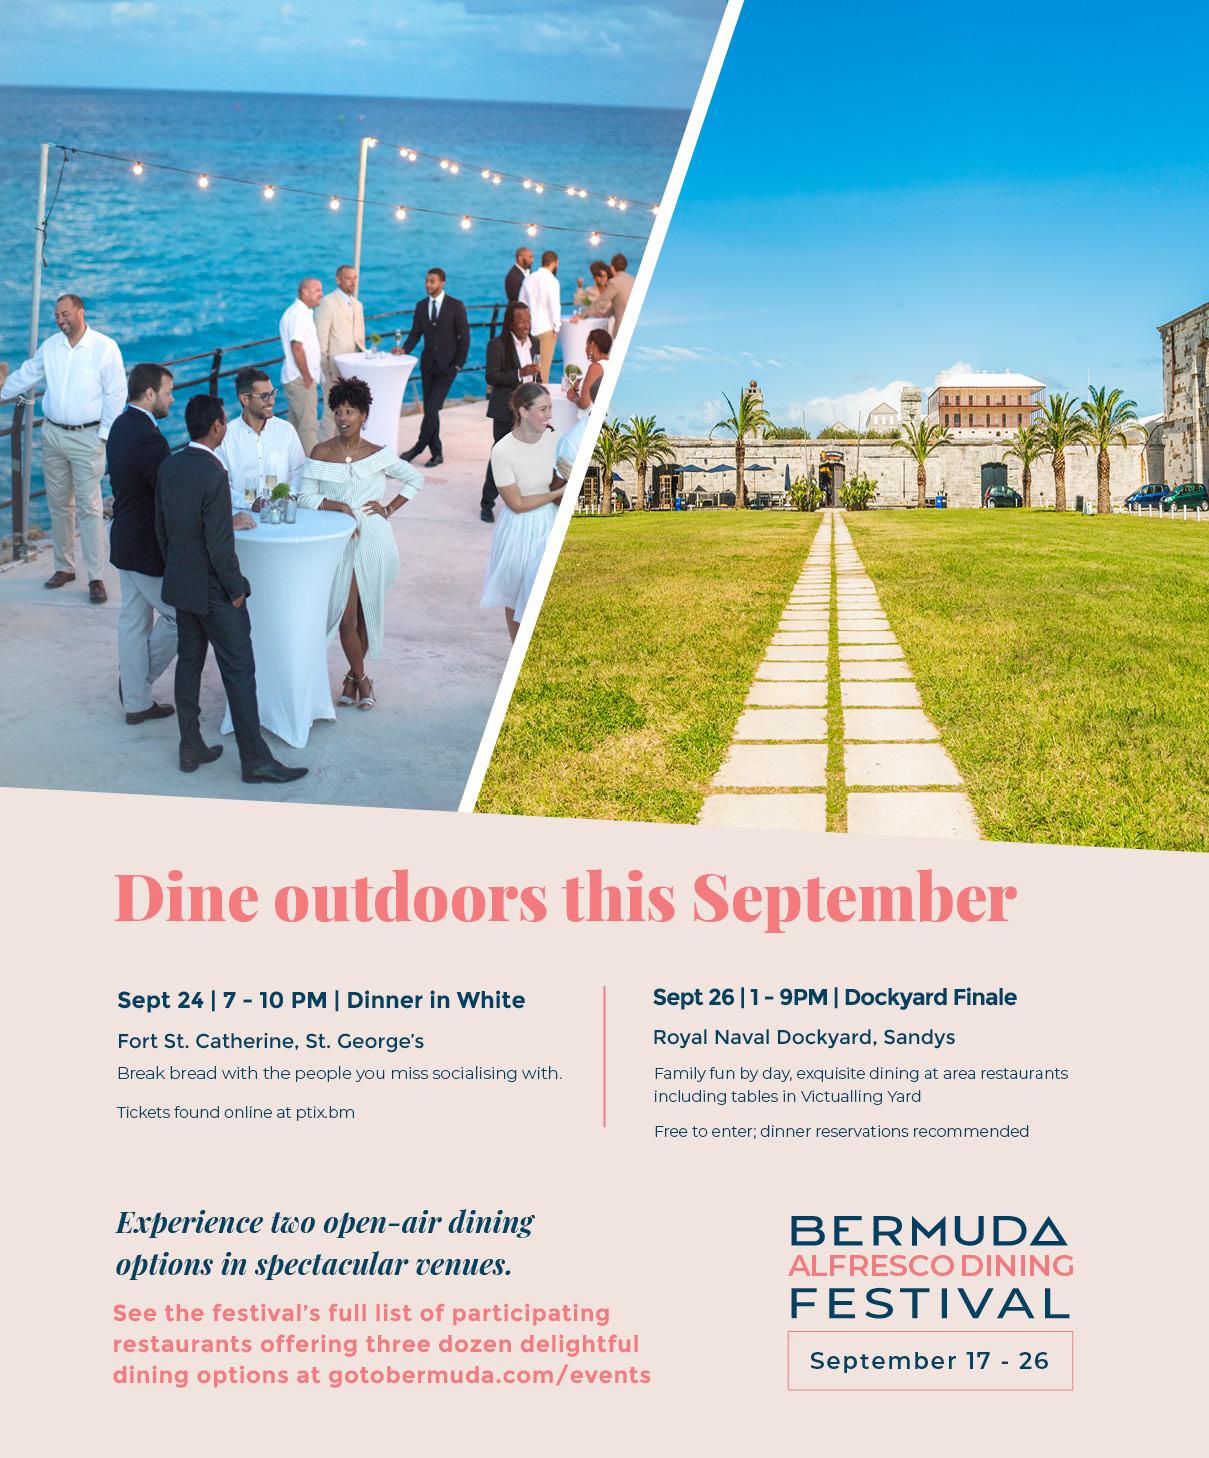 Bermuda Alfresco Dining Festival